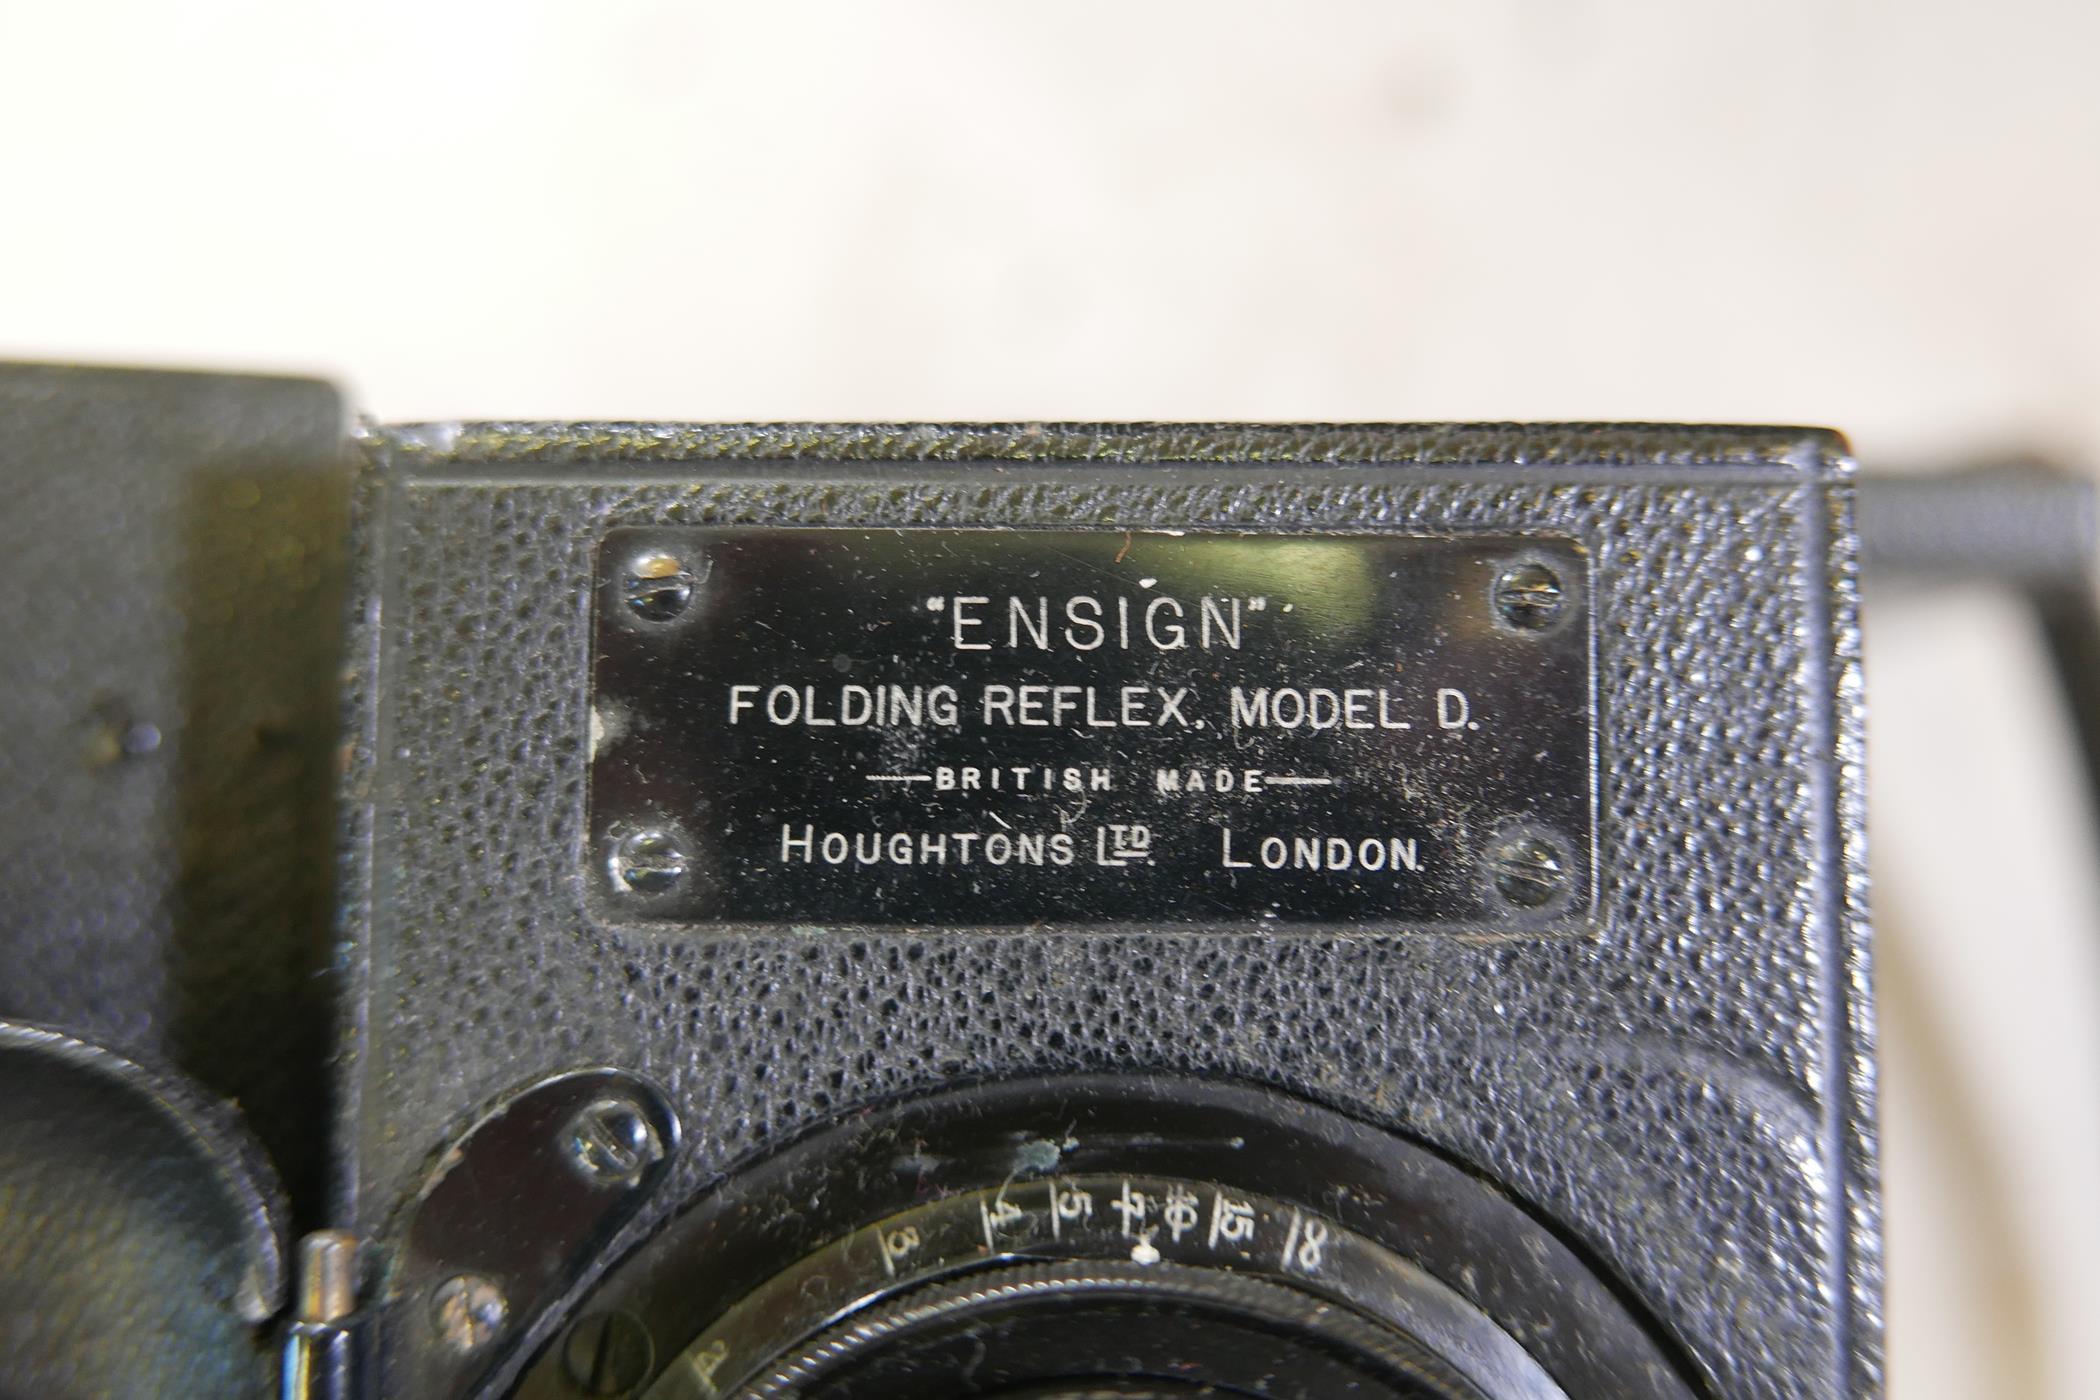 A quantity of antique photography equipment, Engsign Klito, Kodak Duaflex, No2 Hawkeye Model B, - Image 10 of 12